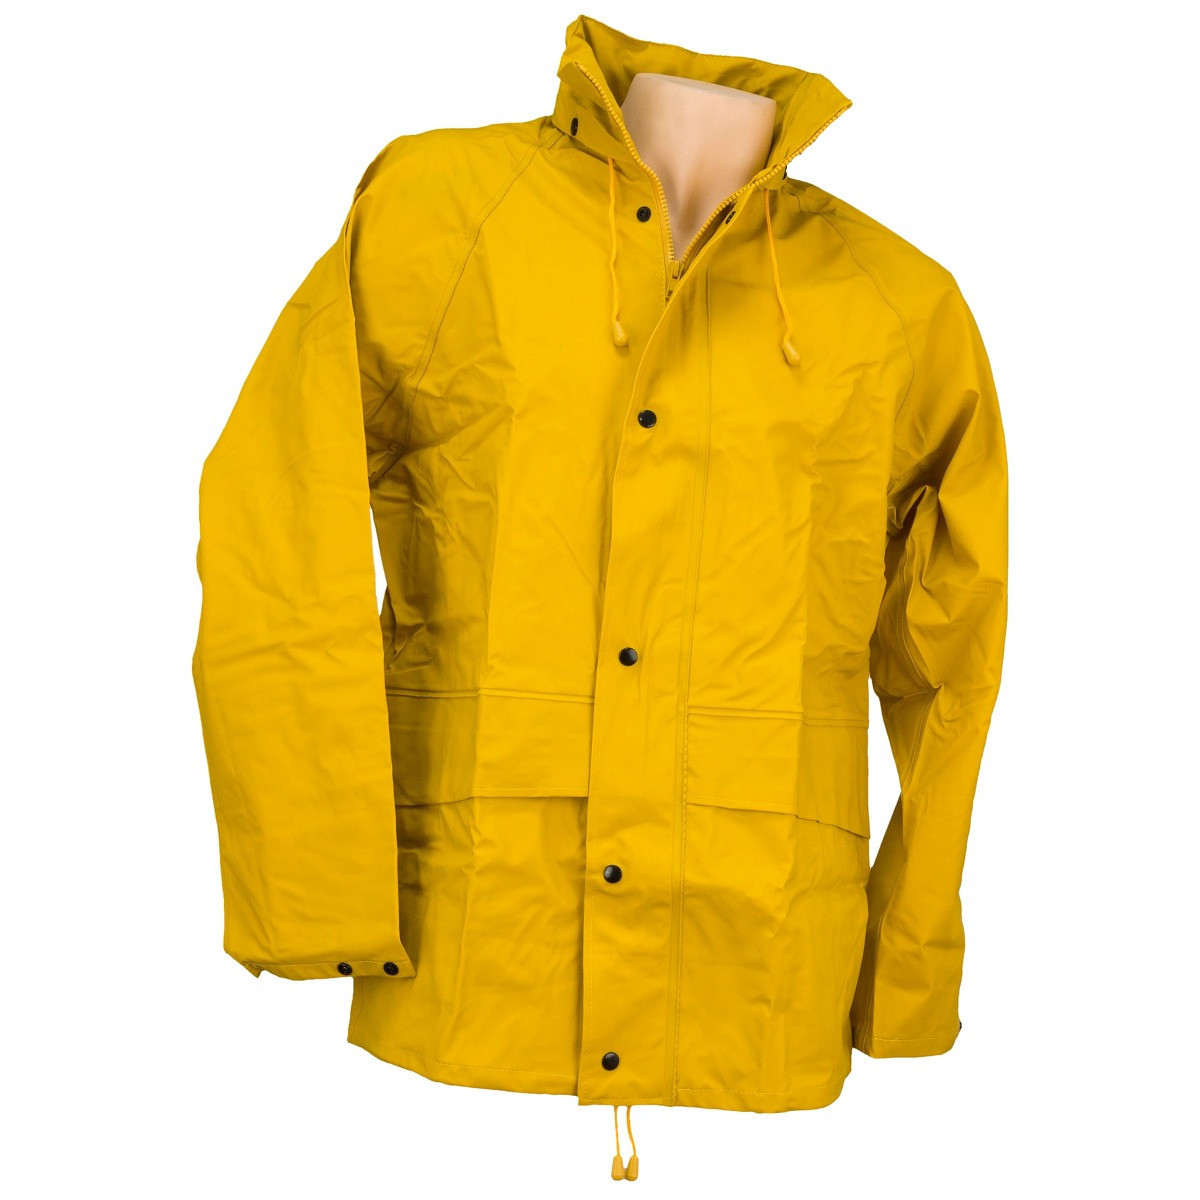 Куртка-дождевик с капюшоном URG-RAIN YELLOW водонепроницаемая, желтого цвета.Urgent (POLAND)